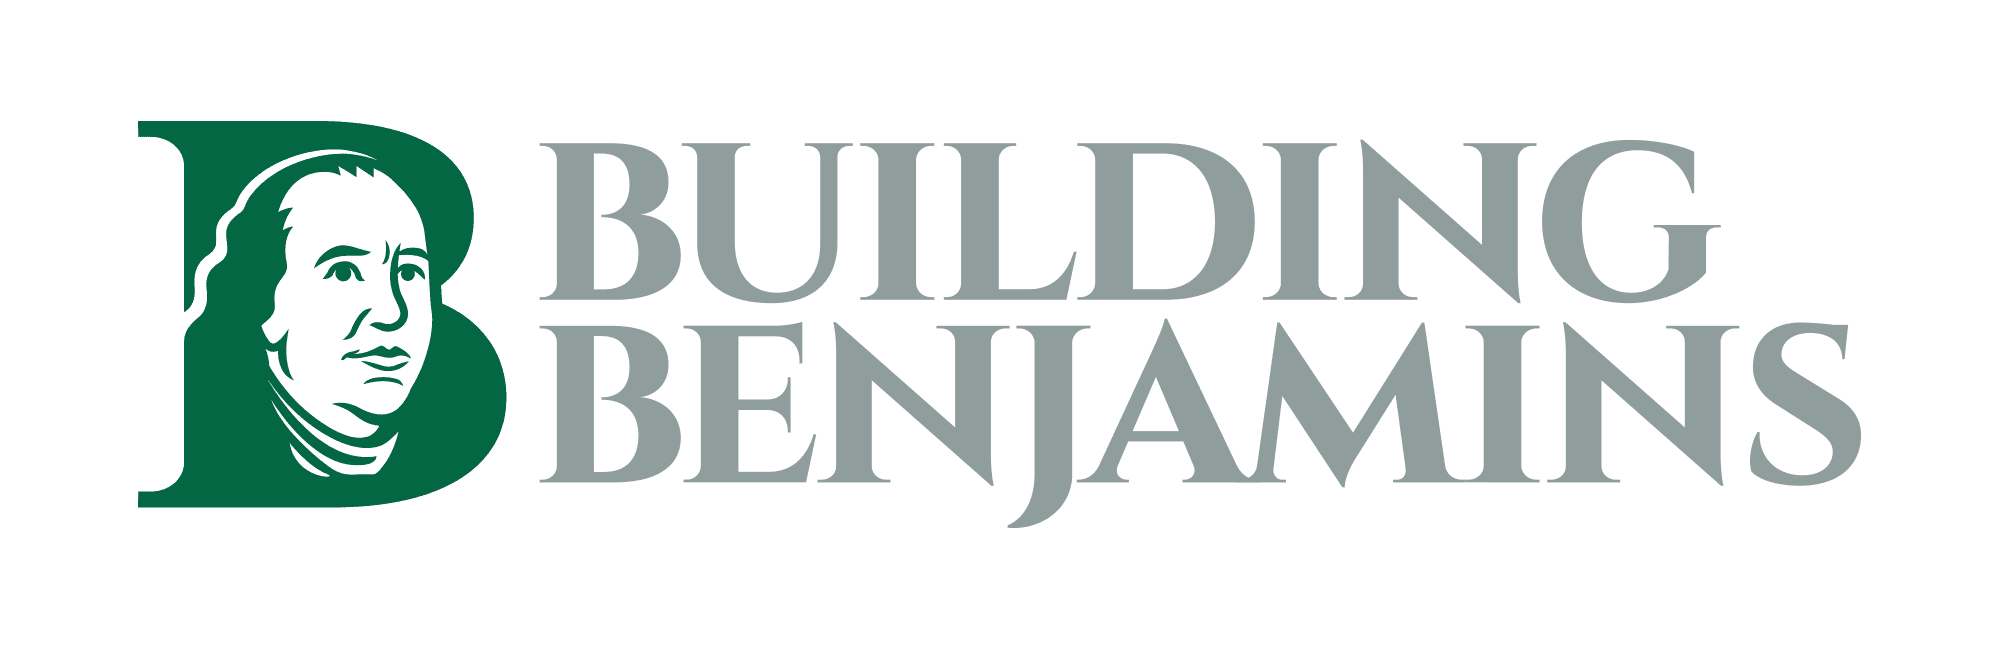 BuildingBenjamins-identity